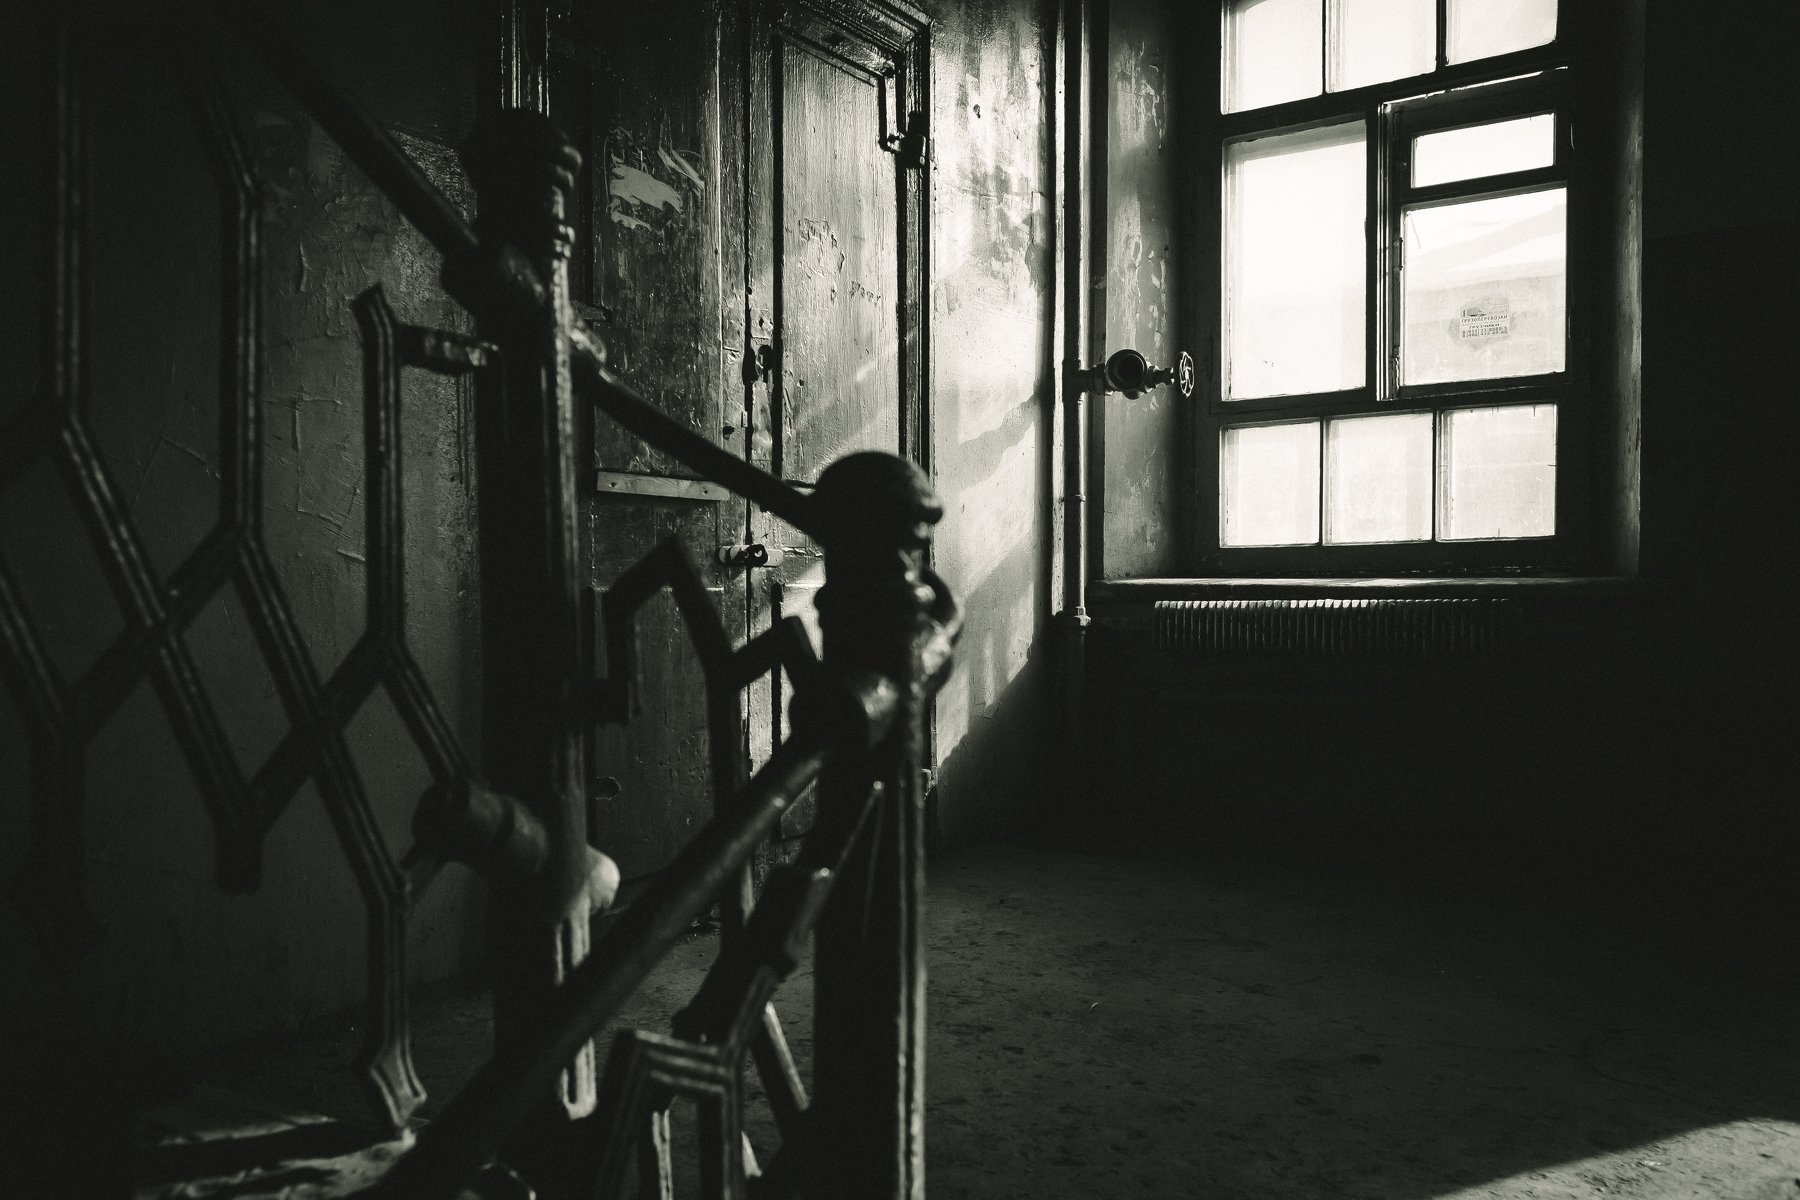 казарма, лестница, окна и двери, Денис Сухачев